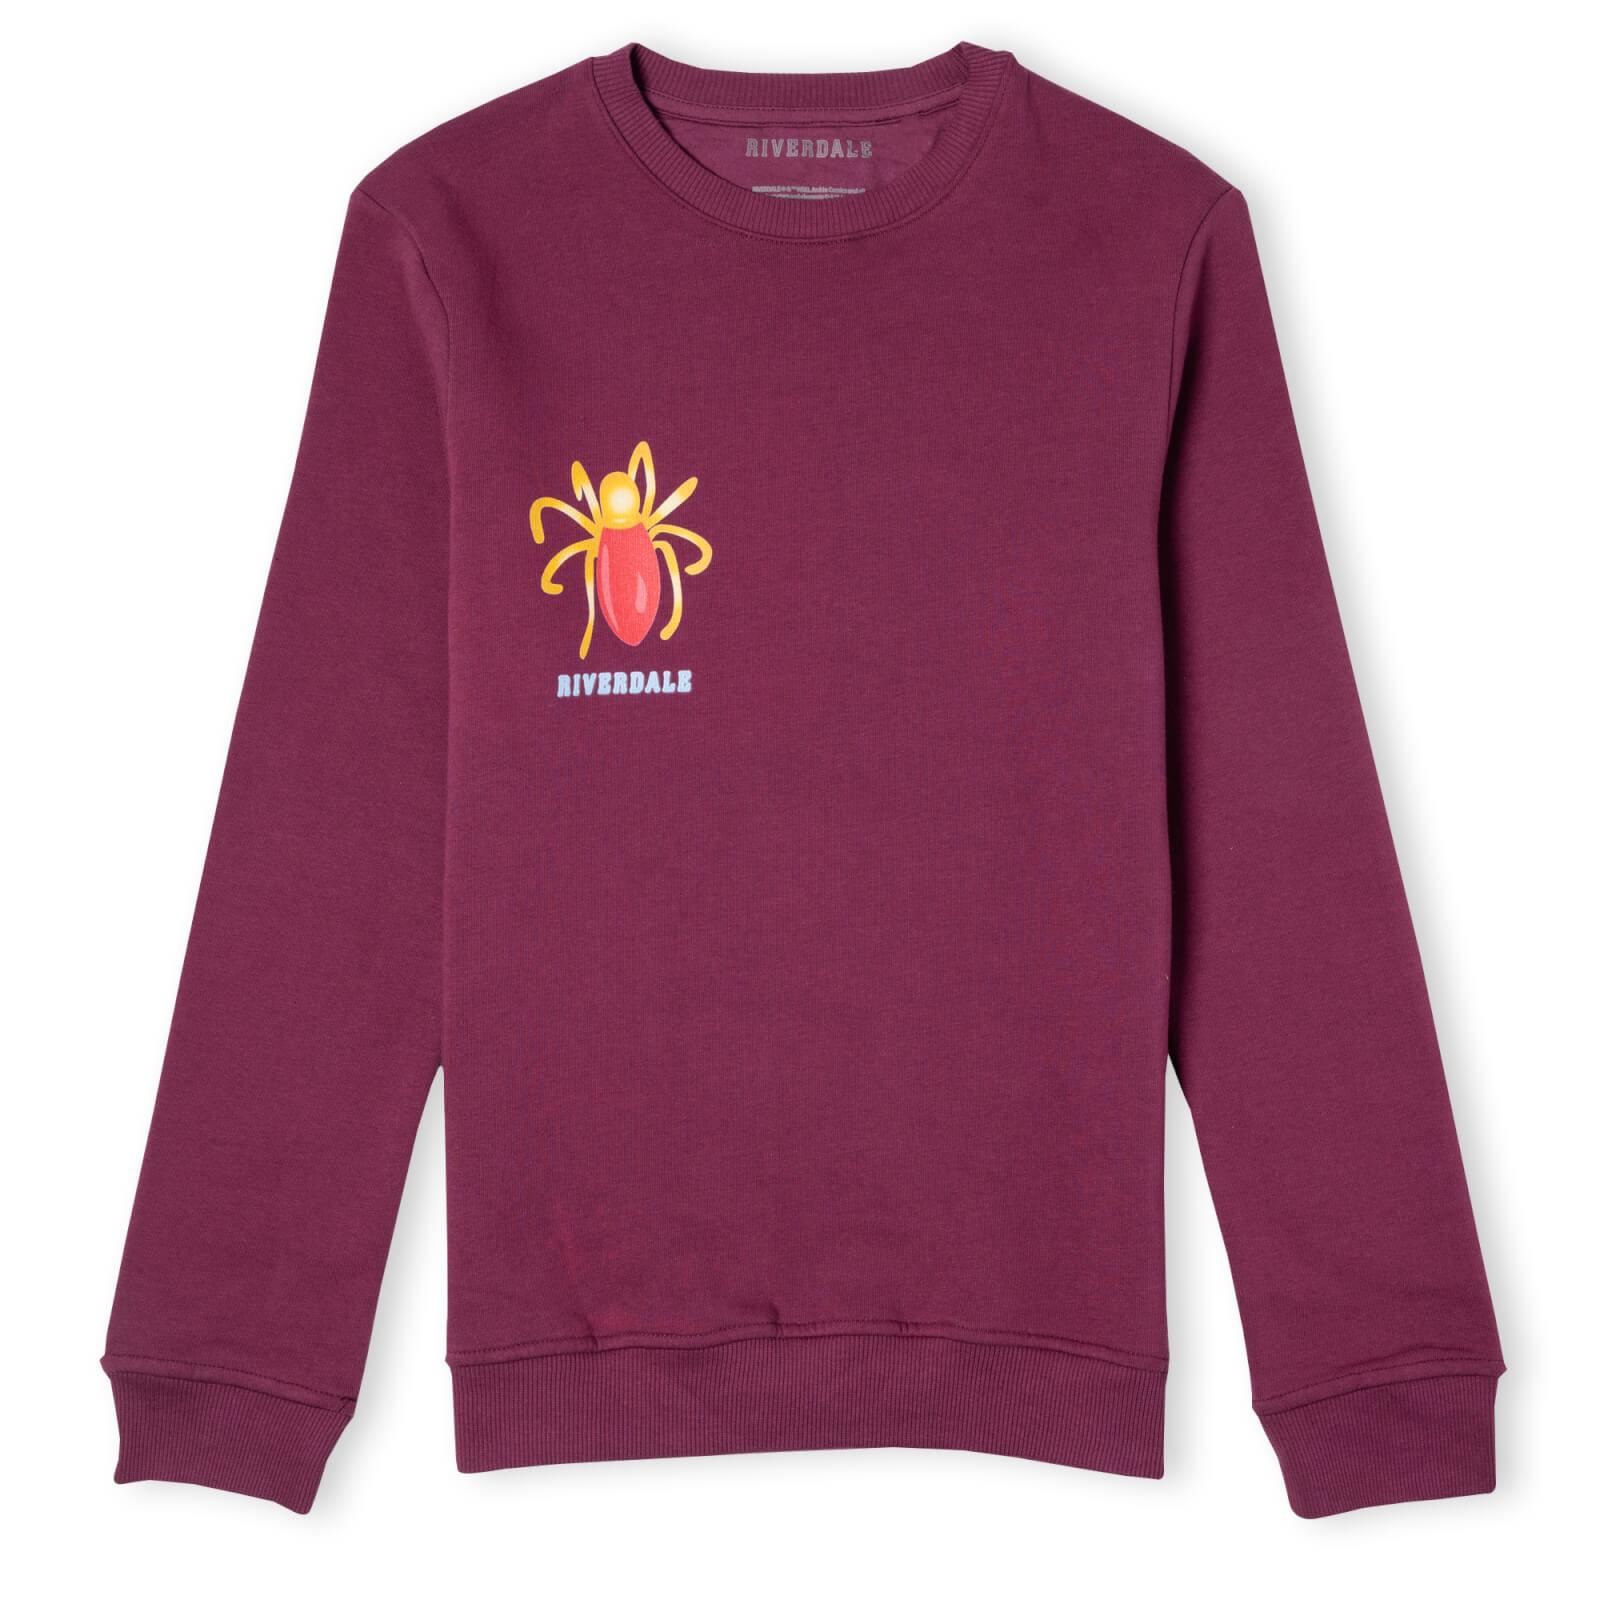 Riverdale Cheryl Blossom Broach Unisex Sweatshirt - Burgundy - L - Burgundy